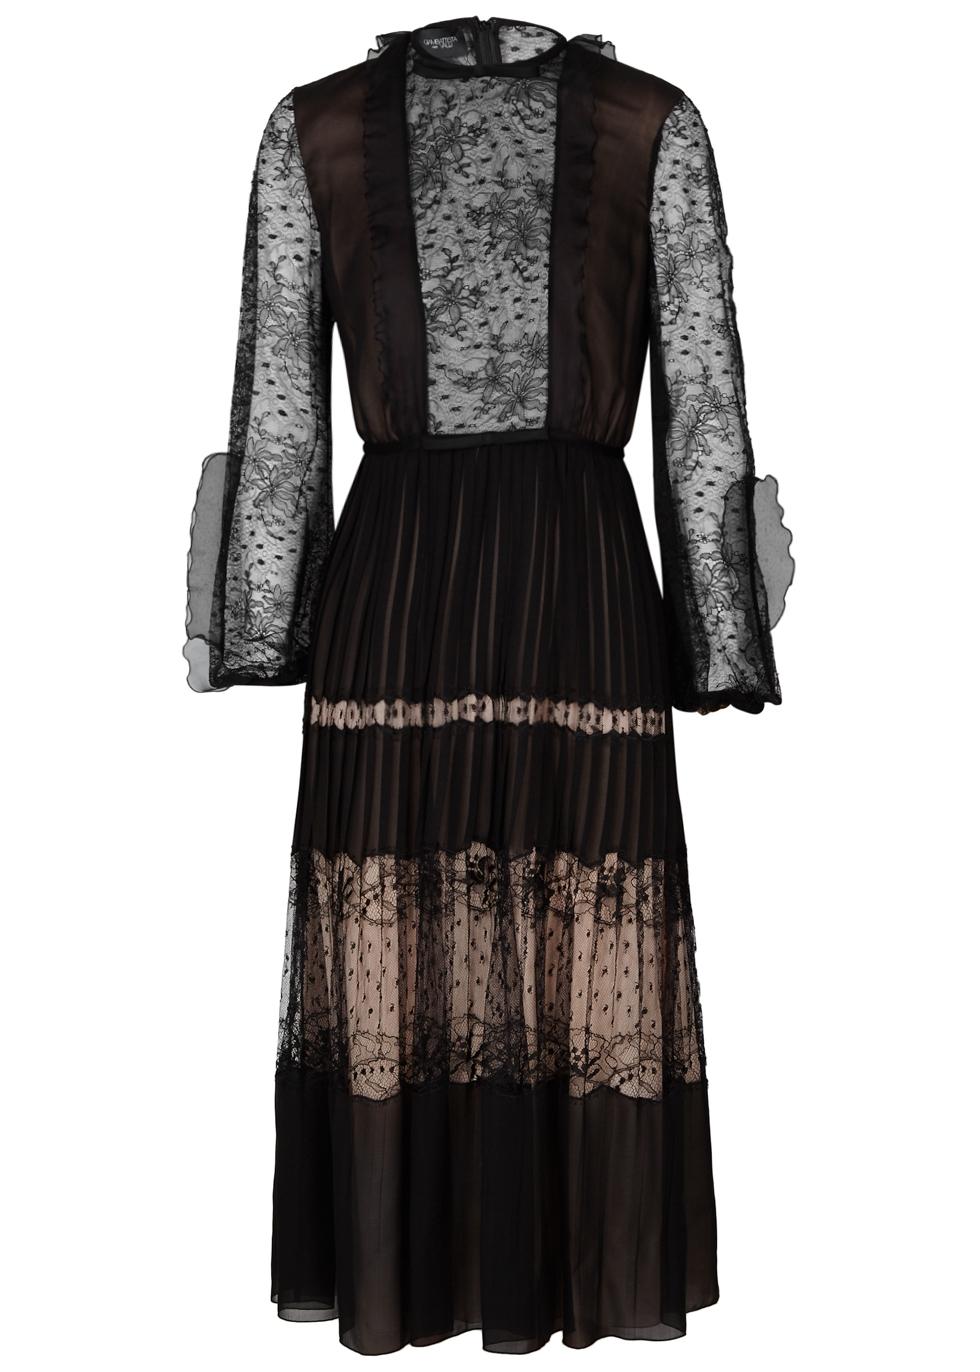 BLACK LACE AND SILK ORGANZA DRESS